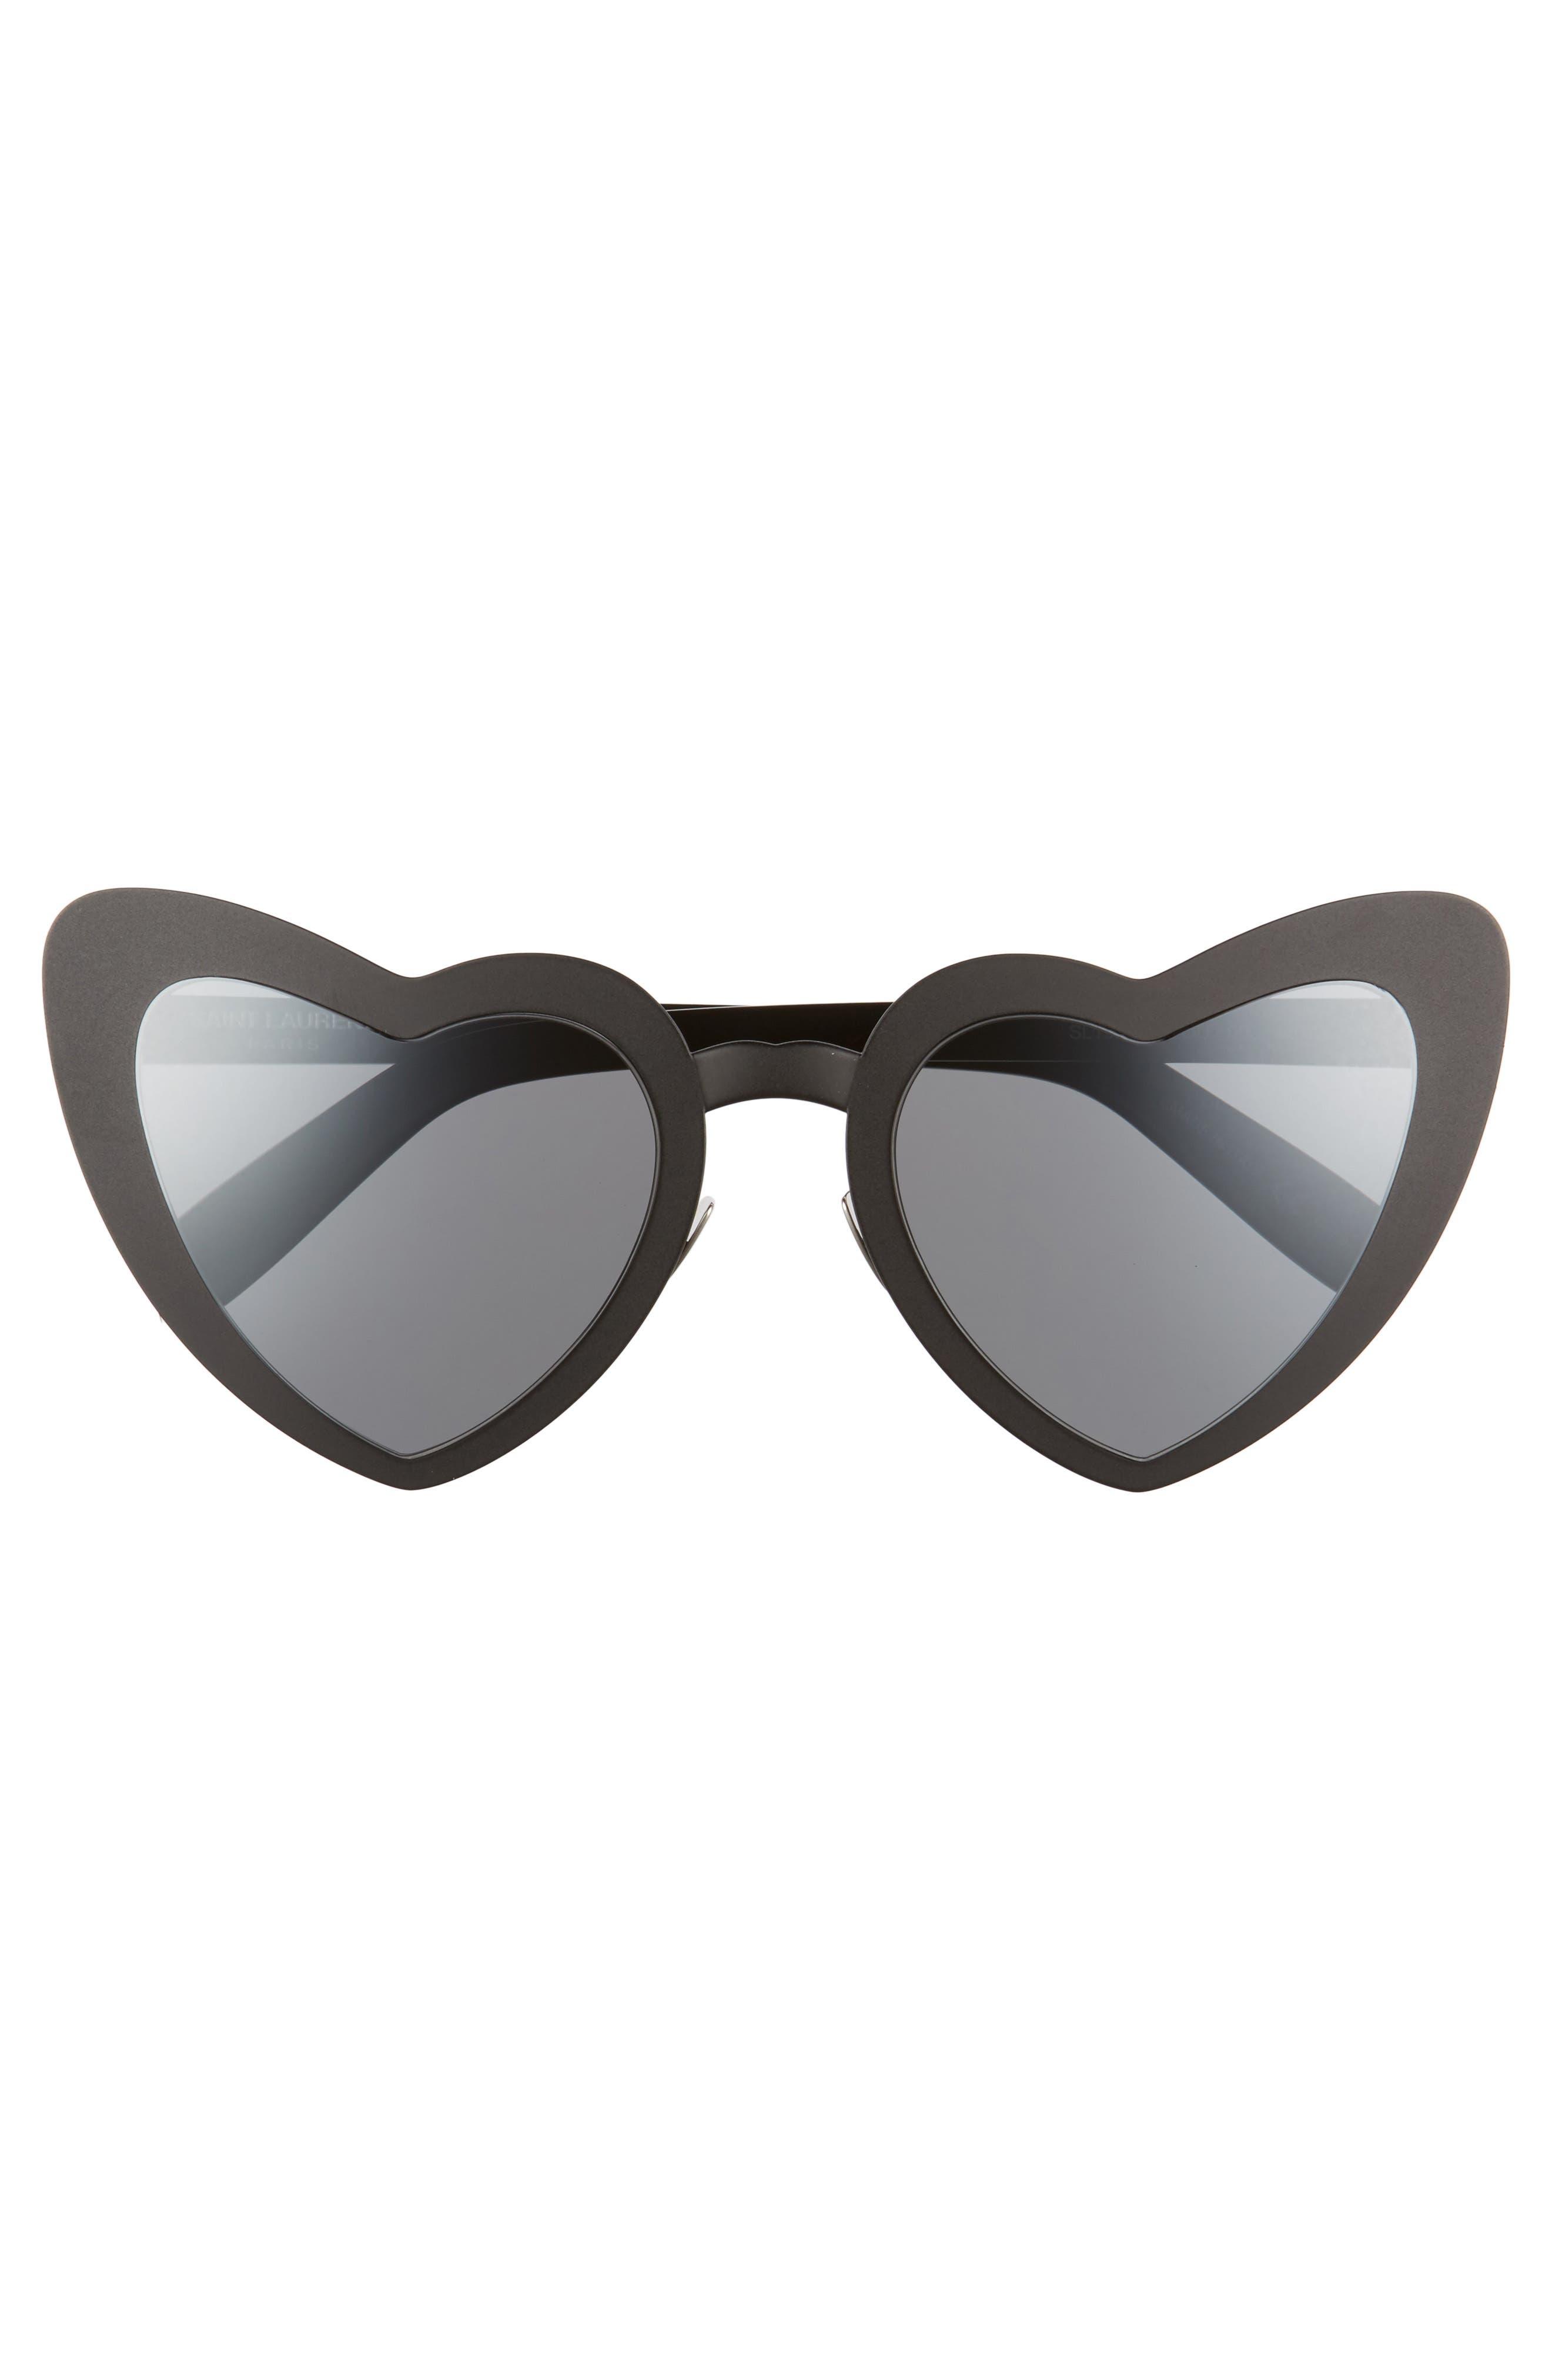 Loulou 55mm Heart Shaped Sunglasses,                             Alternate thumbnail 3, color,                             BLACK